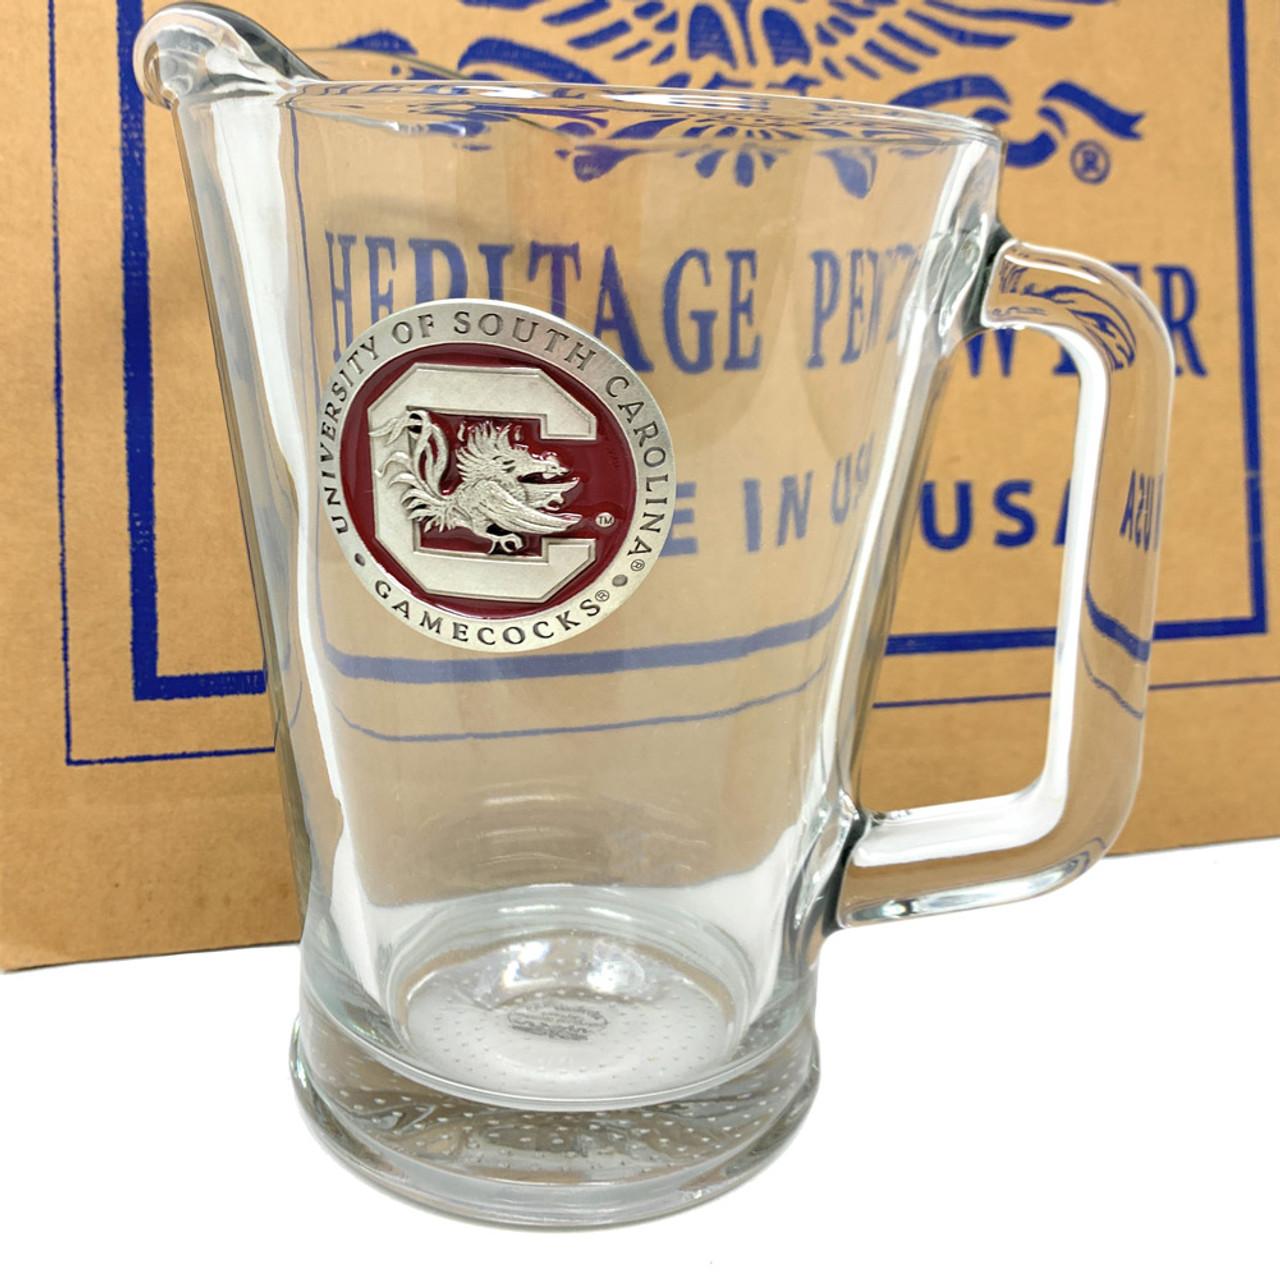 Texas Tech University Pitcher and 2 Stein Glass Set Beer Set